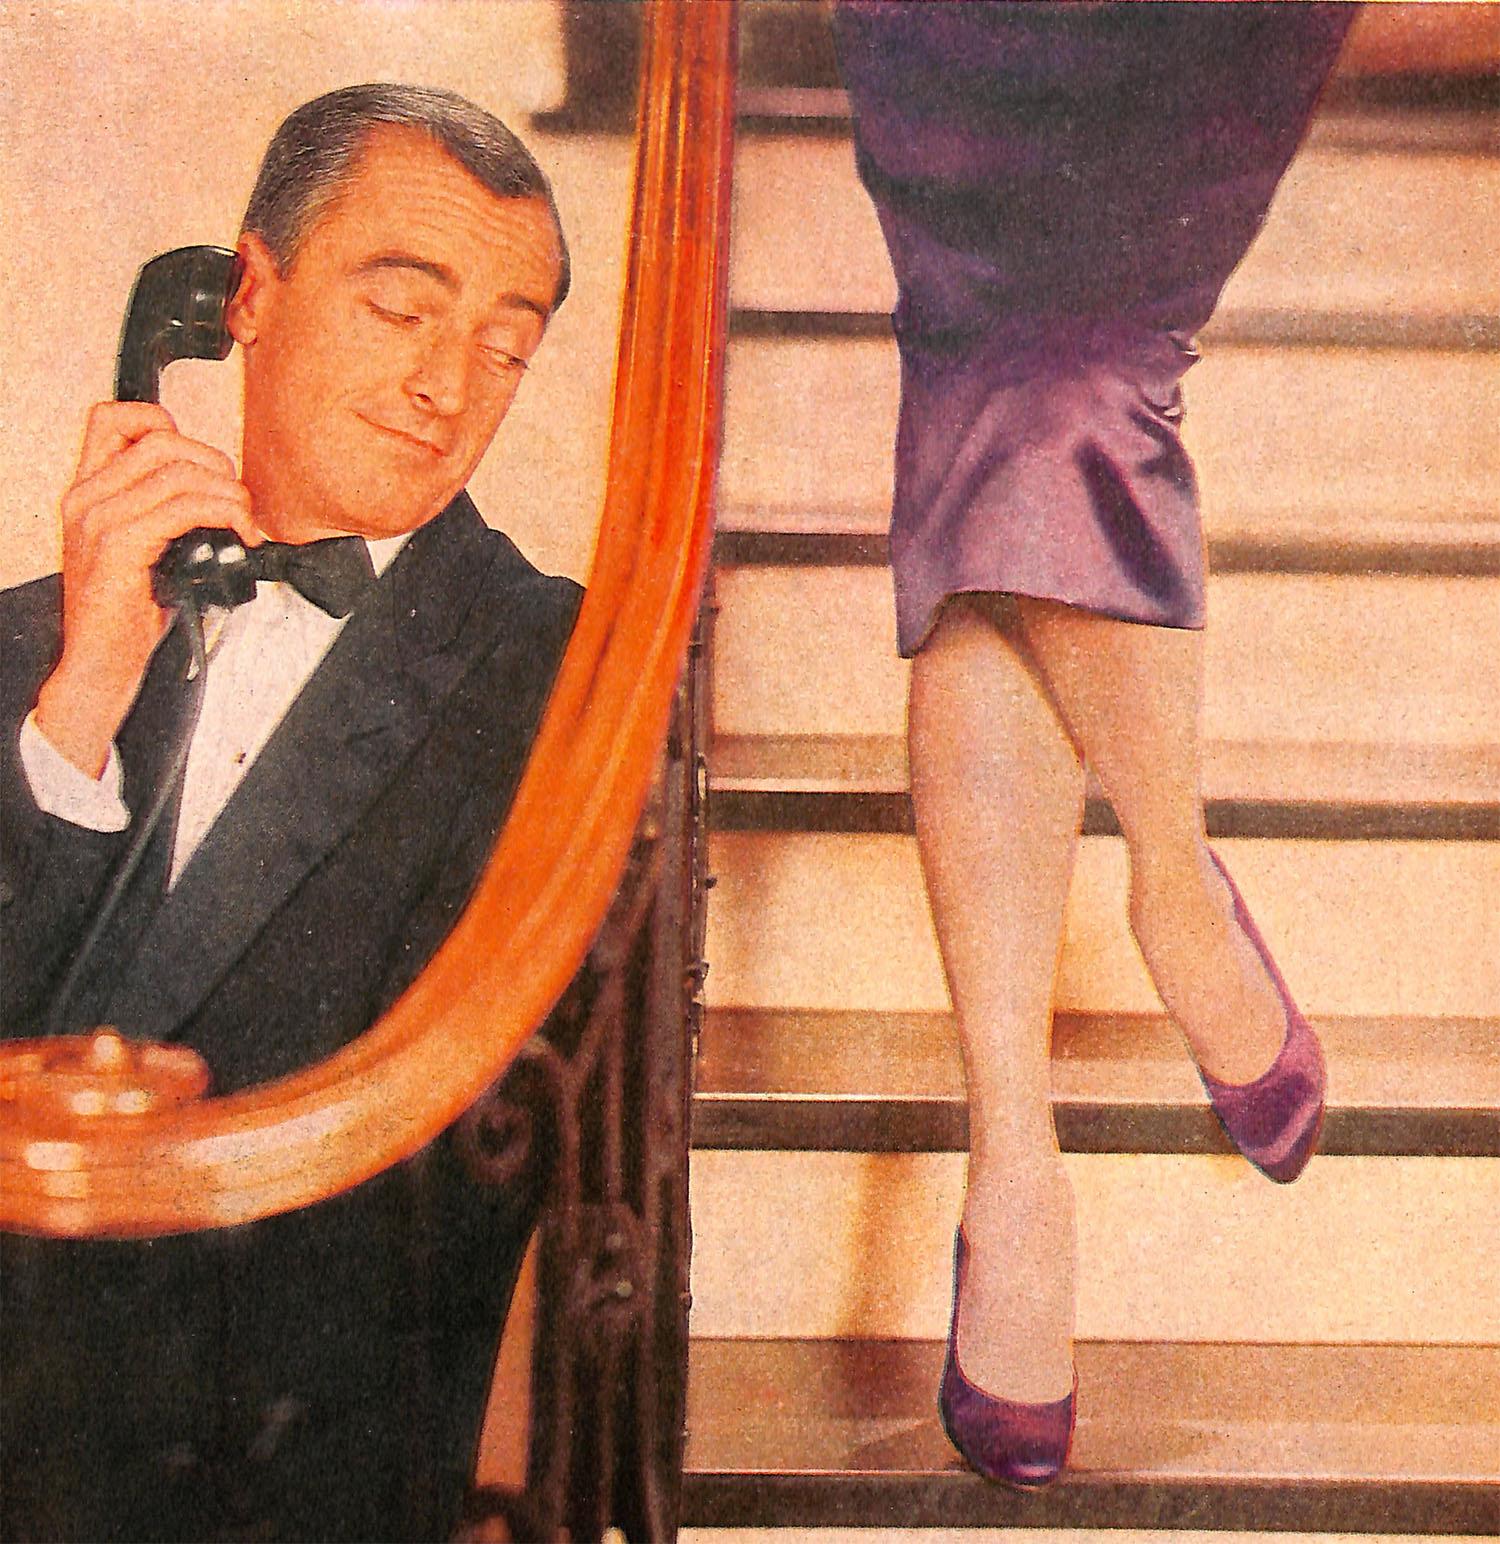 1957 DuPont Nylon Ad